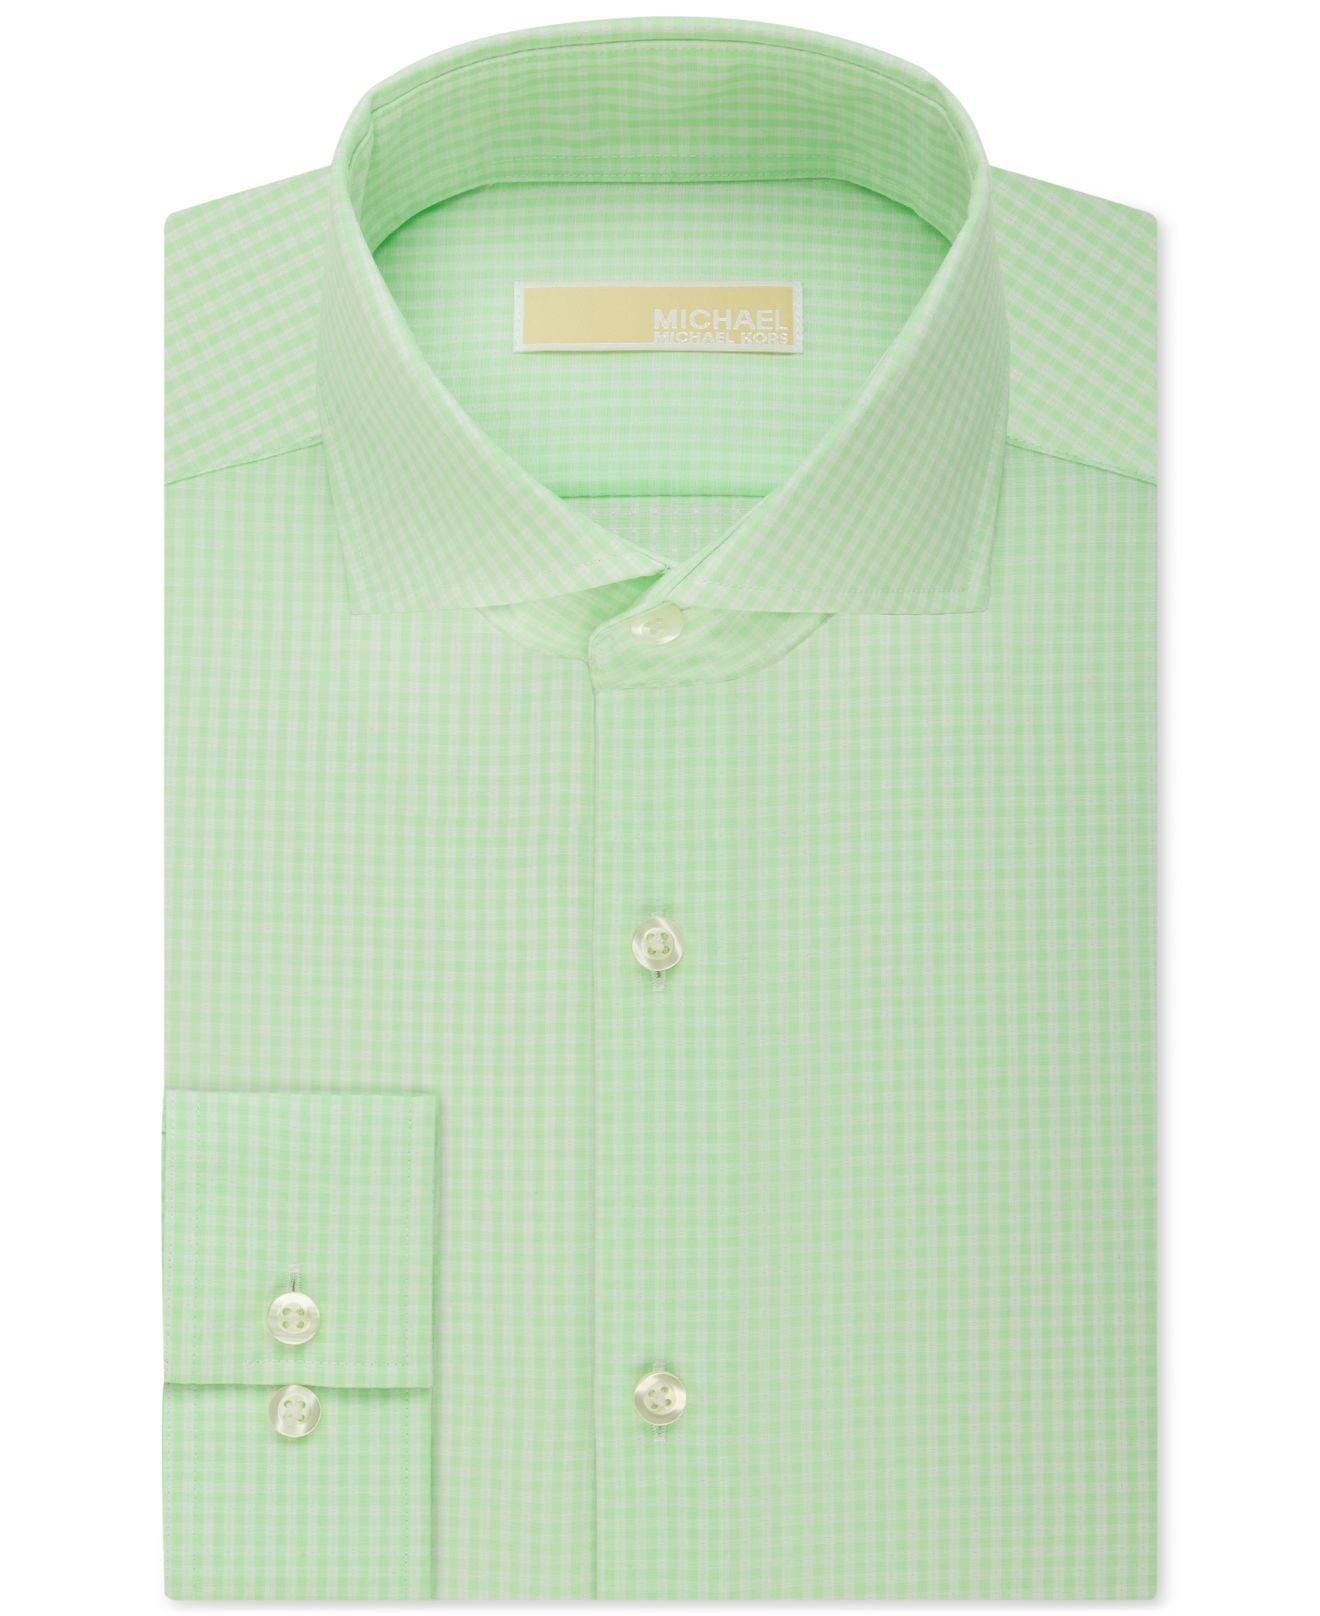 Michael kors michael men 39 s slim fit non iron luna green for Non iron slim fit dress shirts